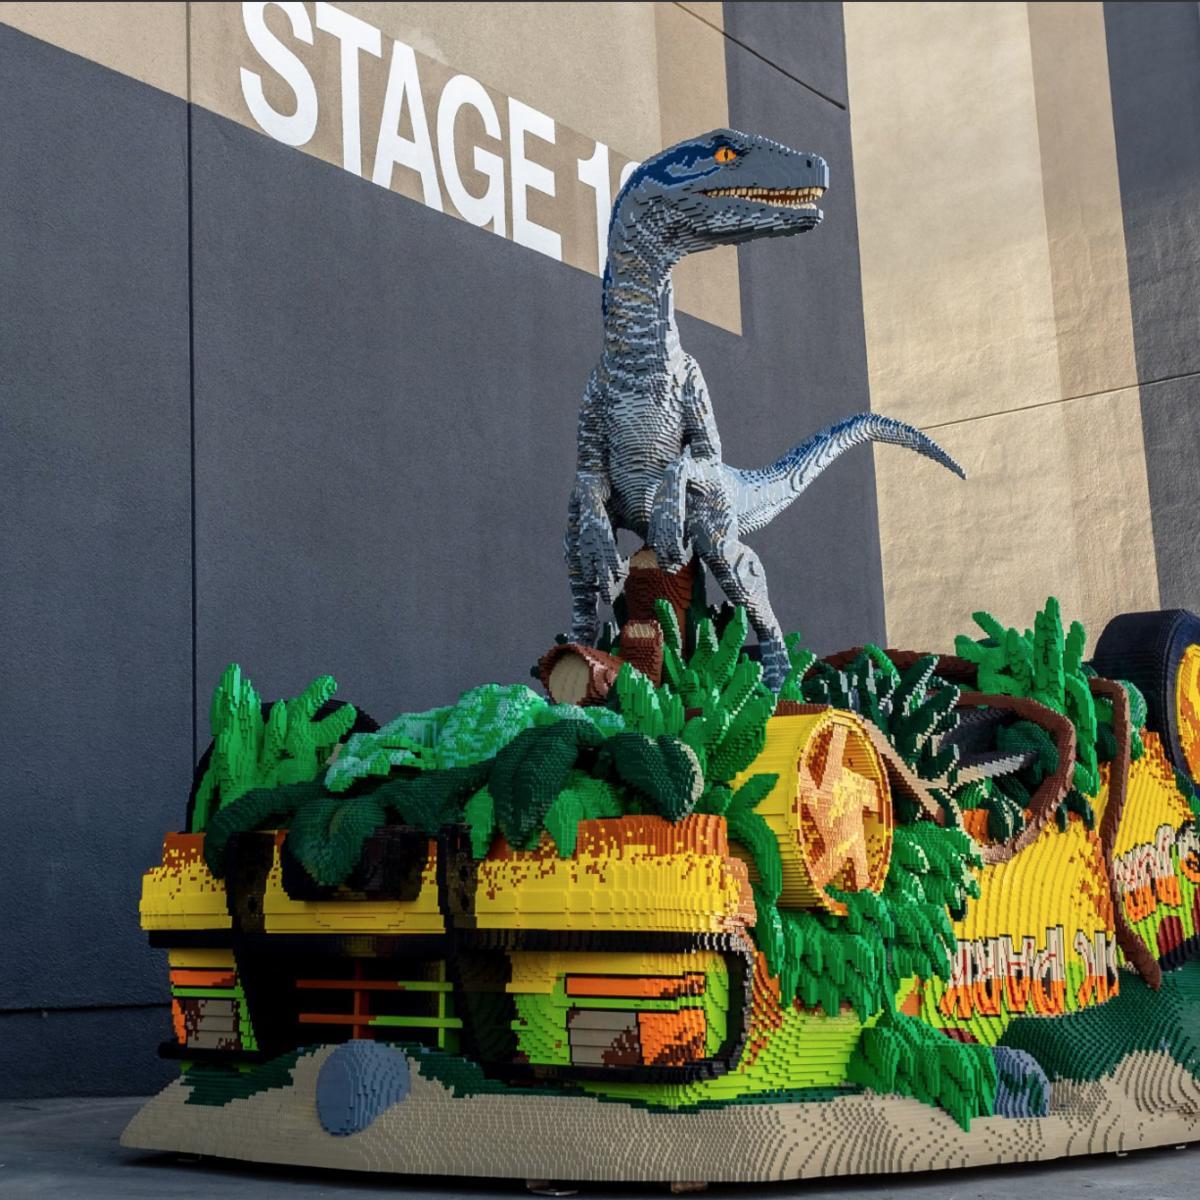 Jurassic World: Fallen Kingdom LEGO sculpt